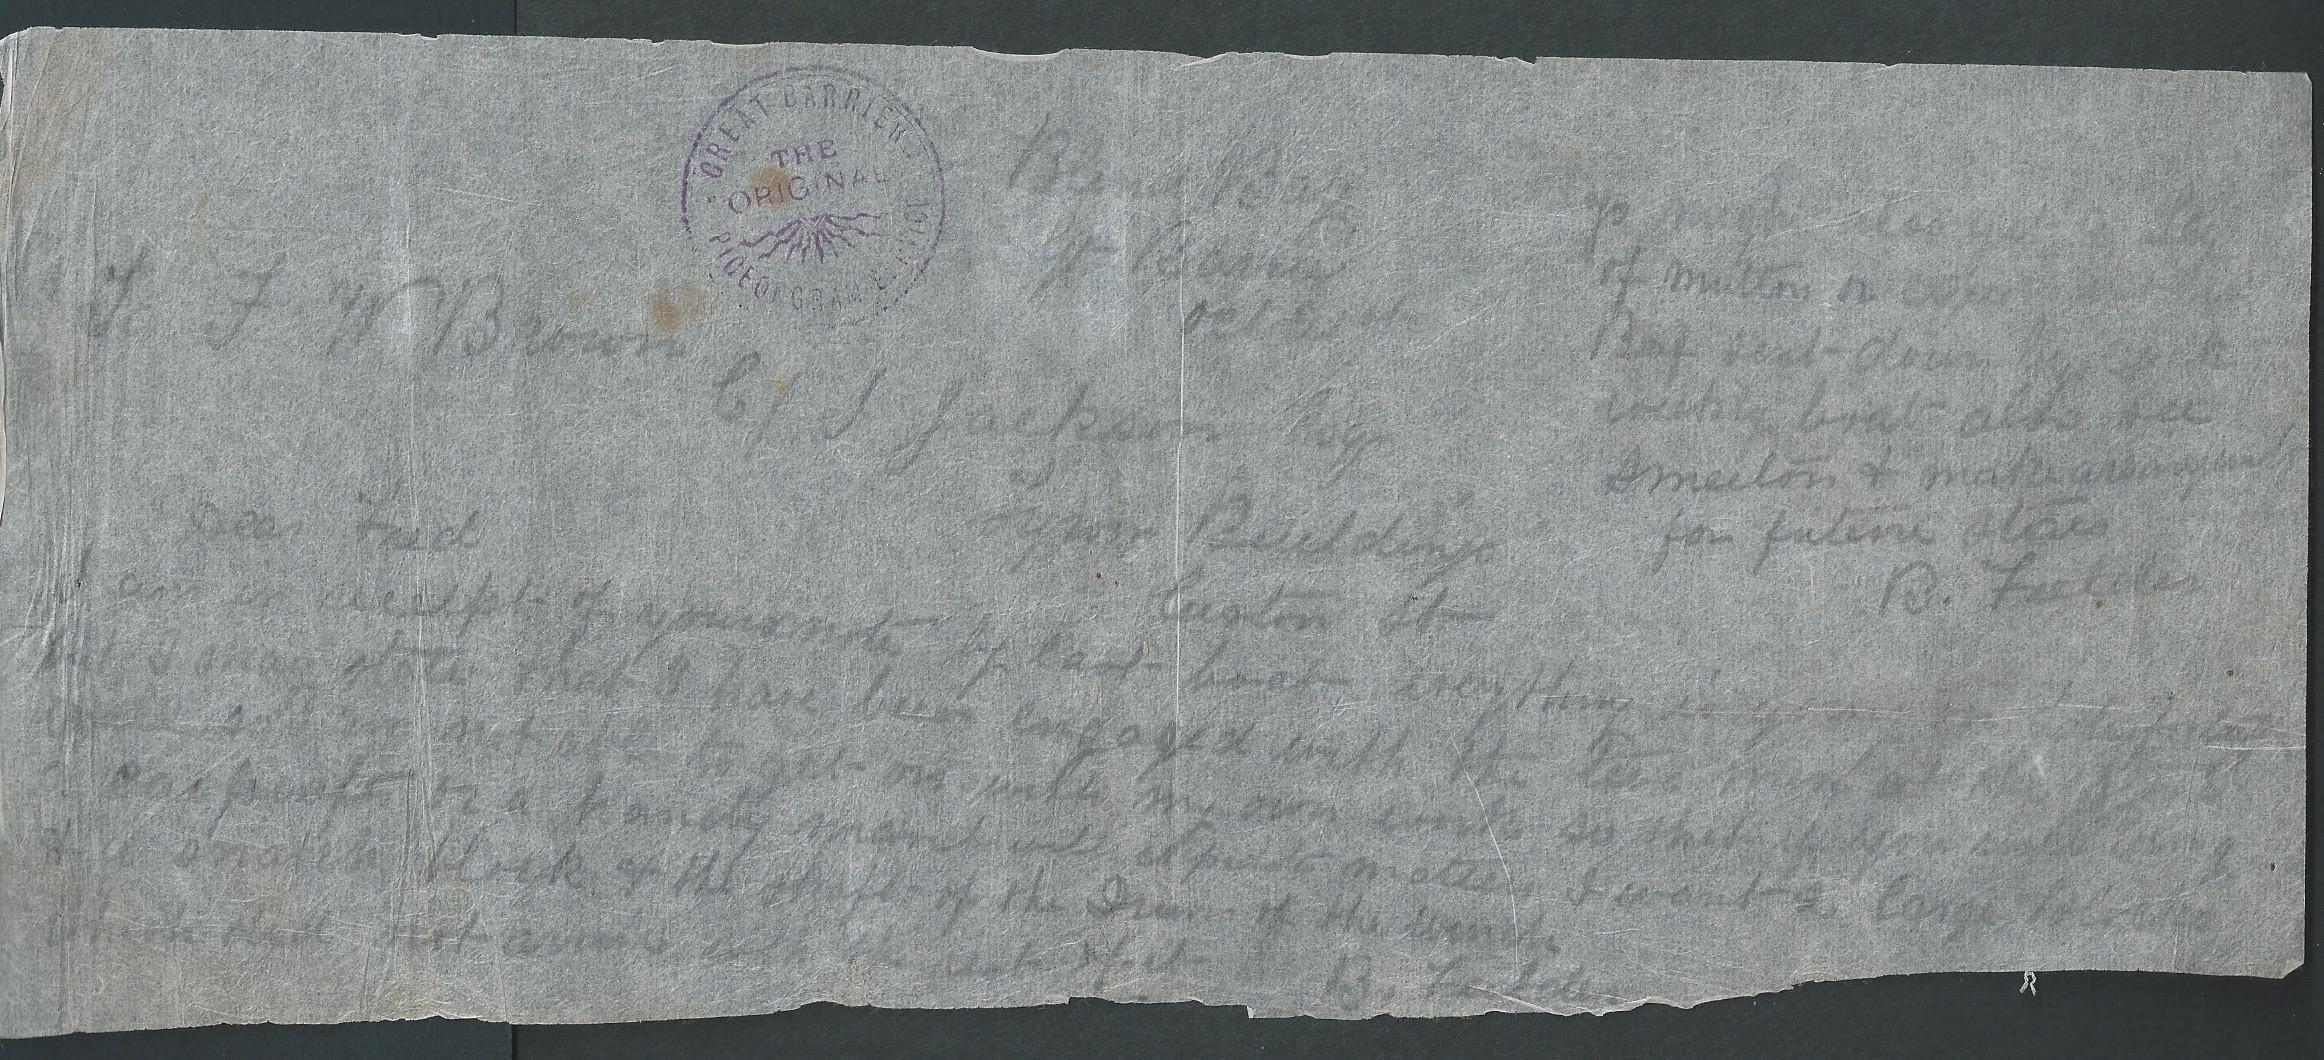 New Zealand c.1899 Great Barrier Island Pigeongram staples flimsy message